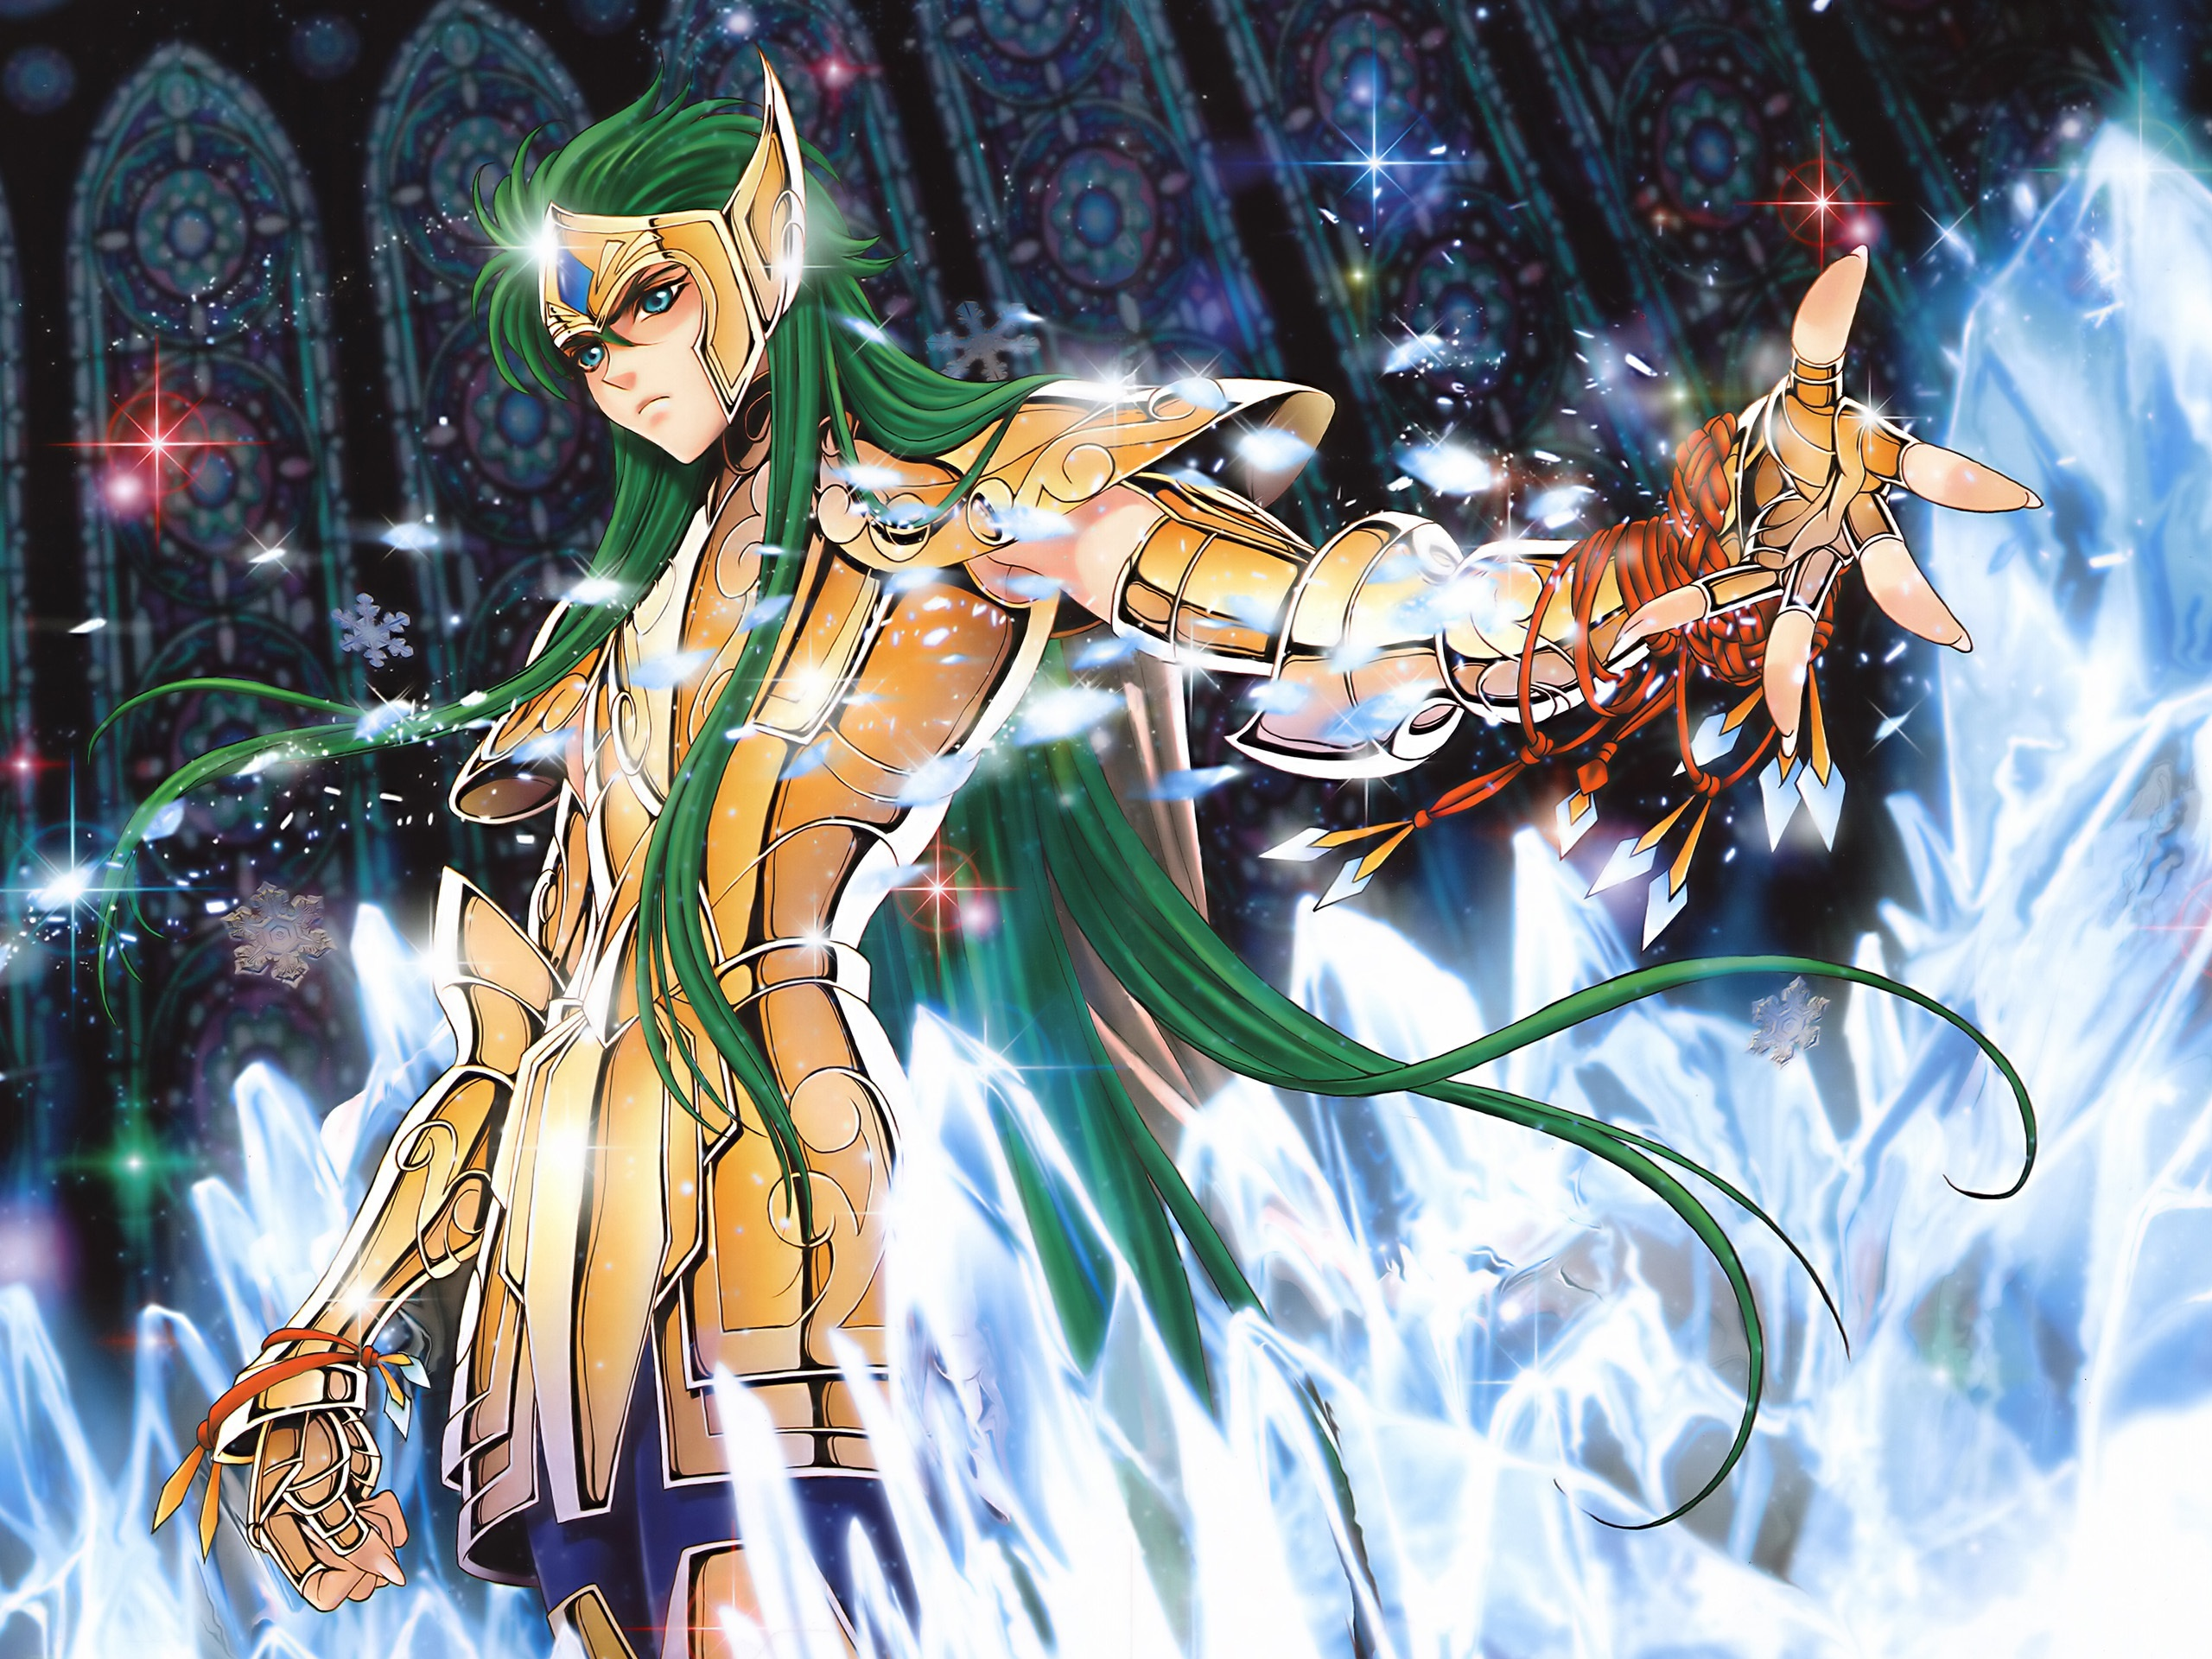 saint seiya hd wallpaper background image 2560x1920 id 341880